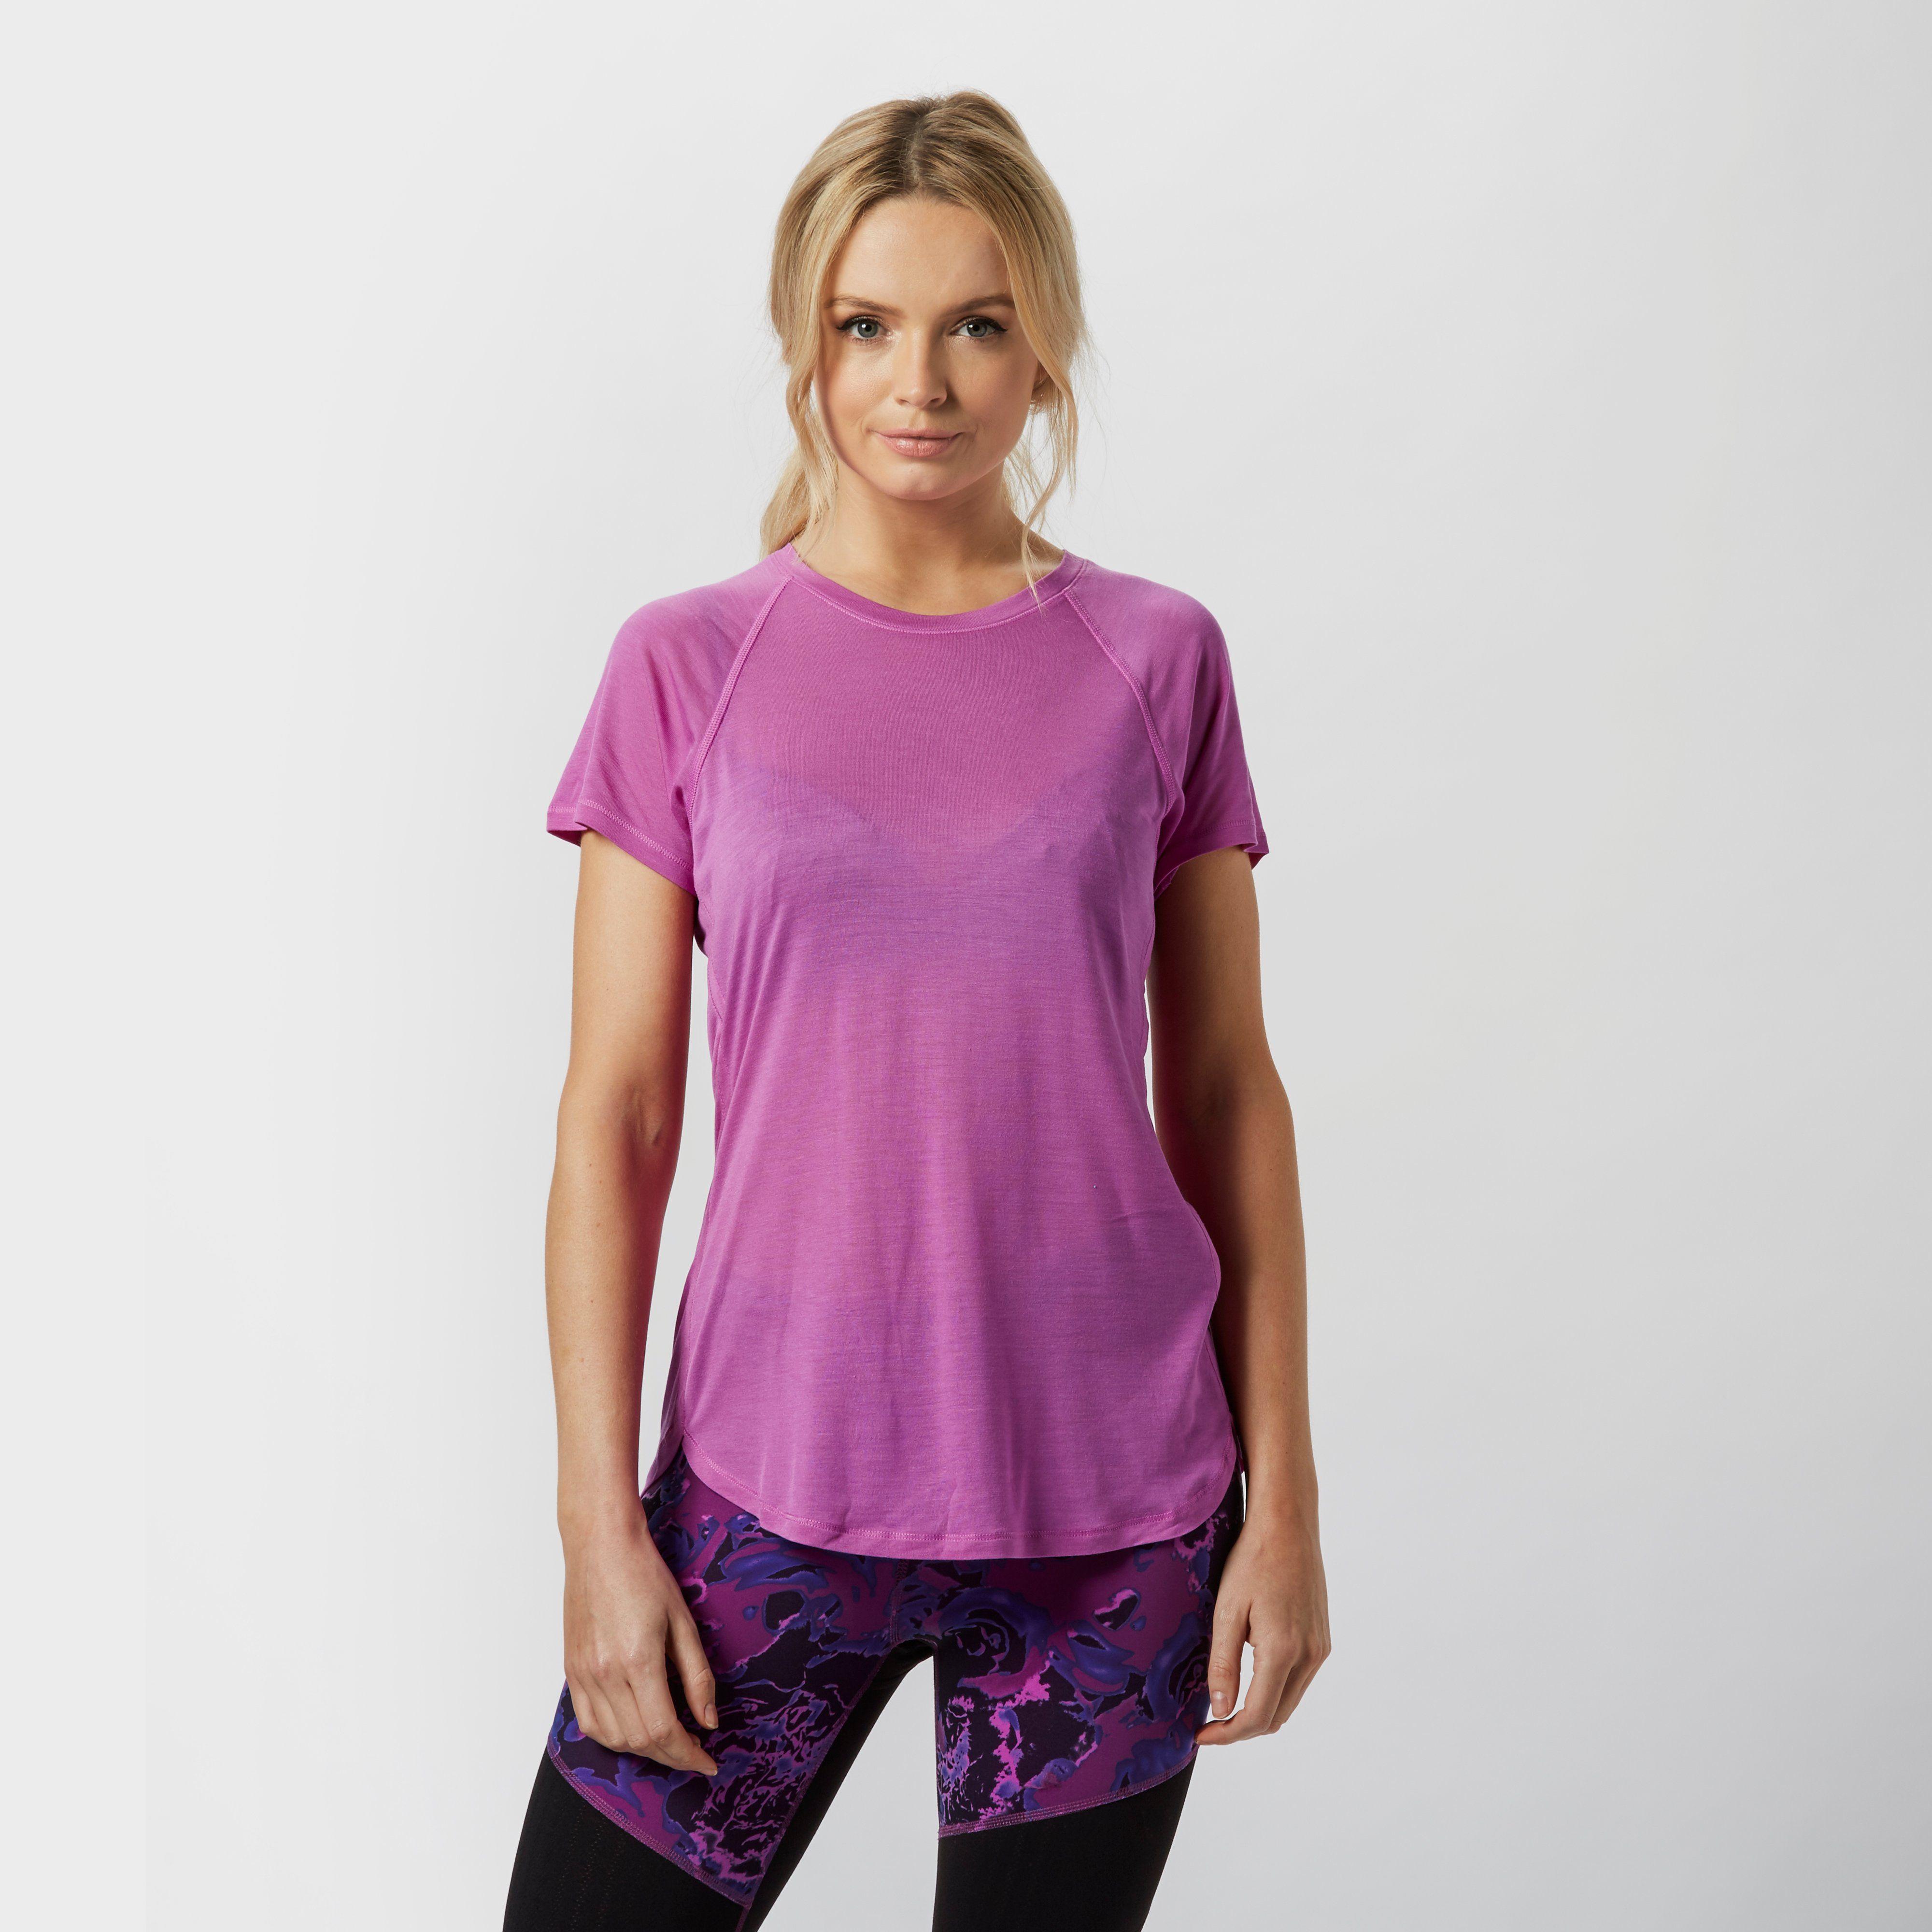 THE NORTH FACE Women's Versitas T-Shirt